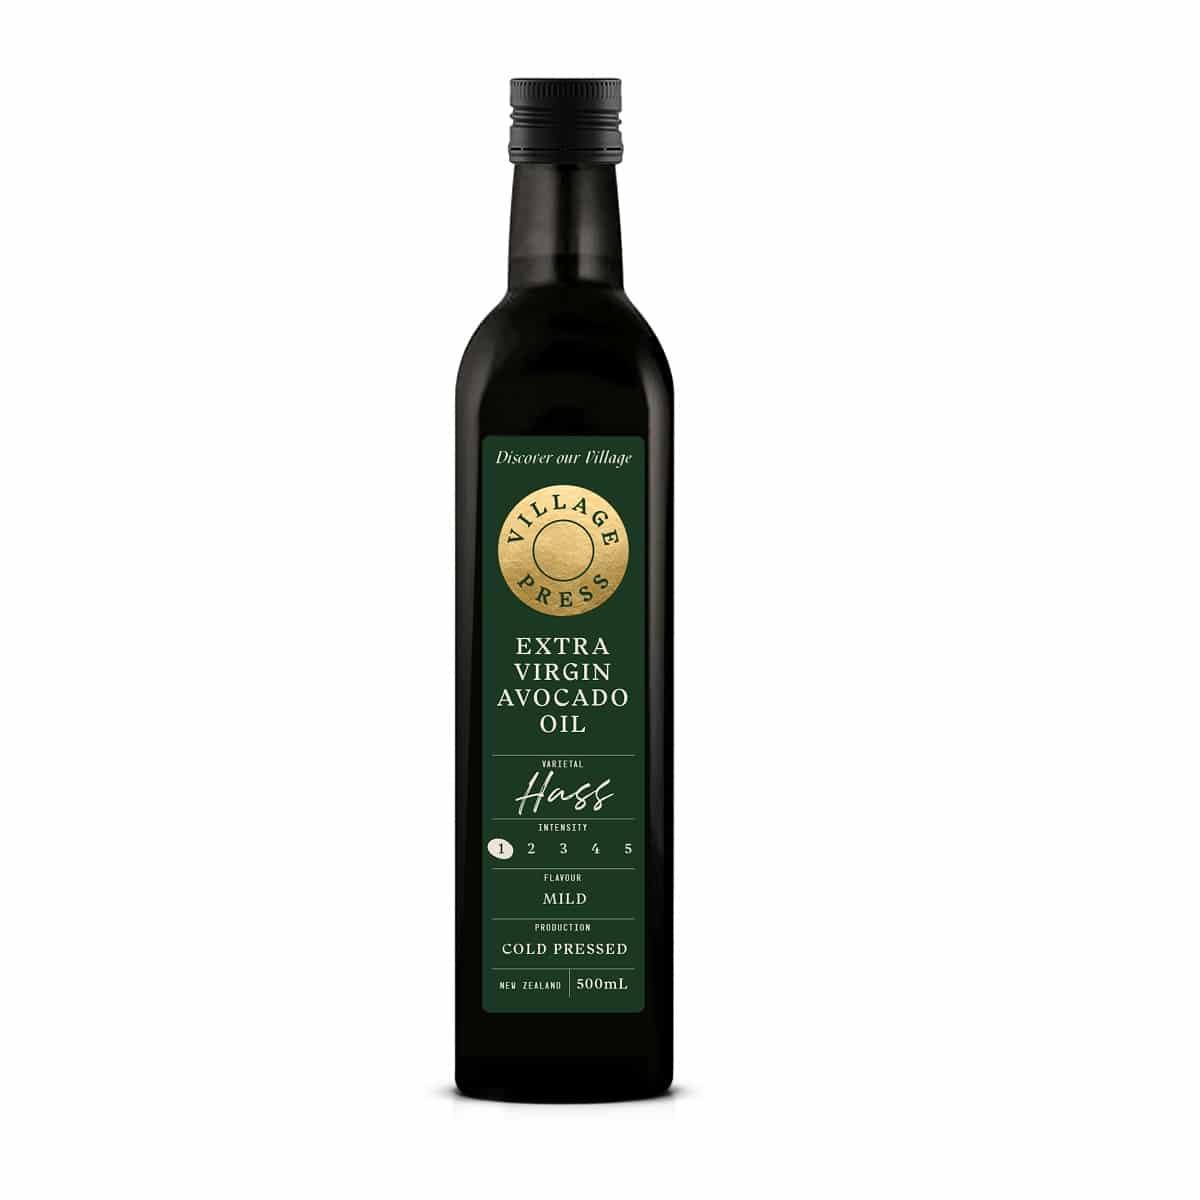 WEB Village Press – Avocado Oil 500ml